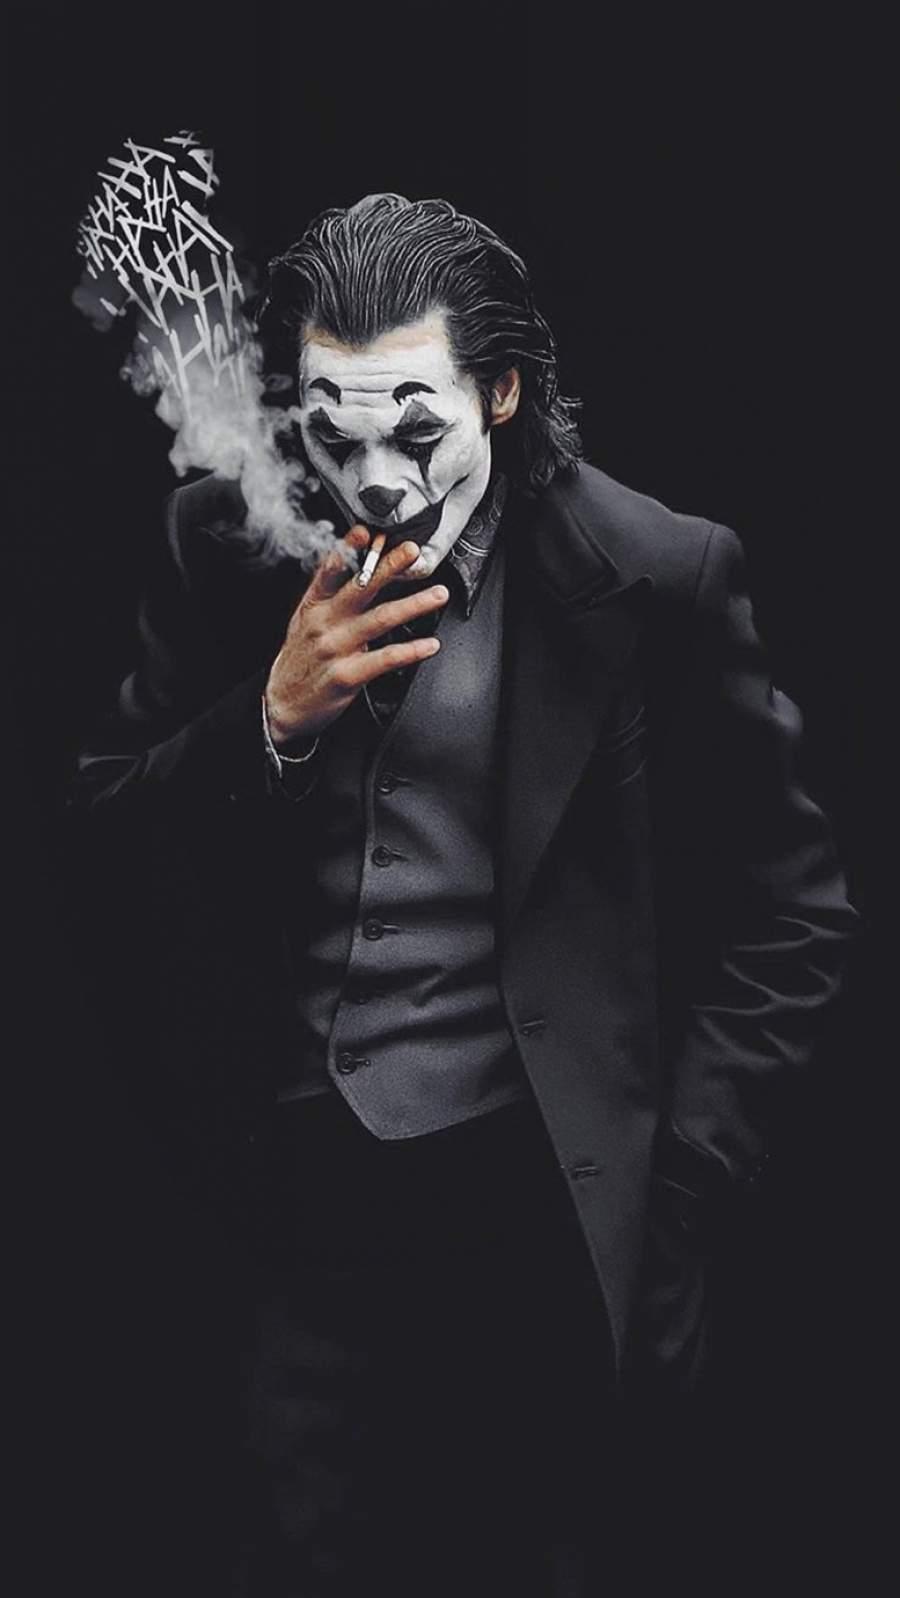 Joker Smoke Laugh iPhone Wallpaper